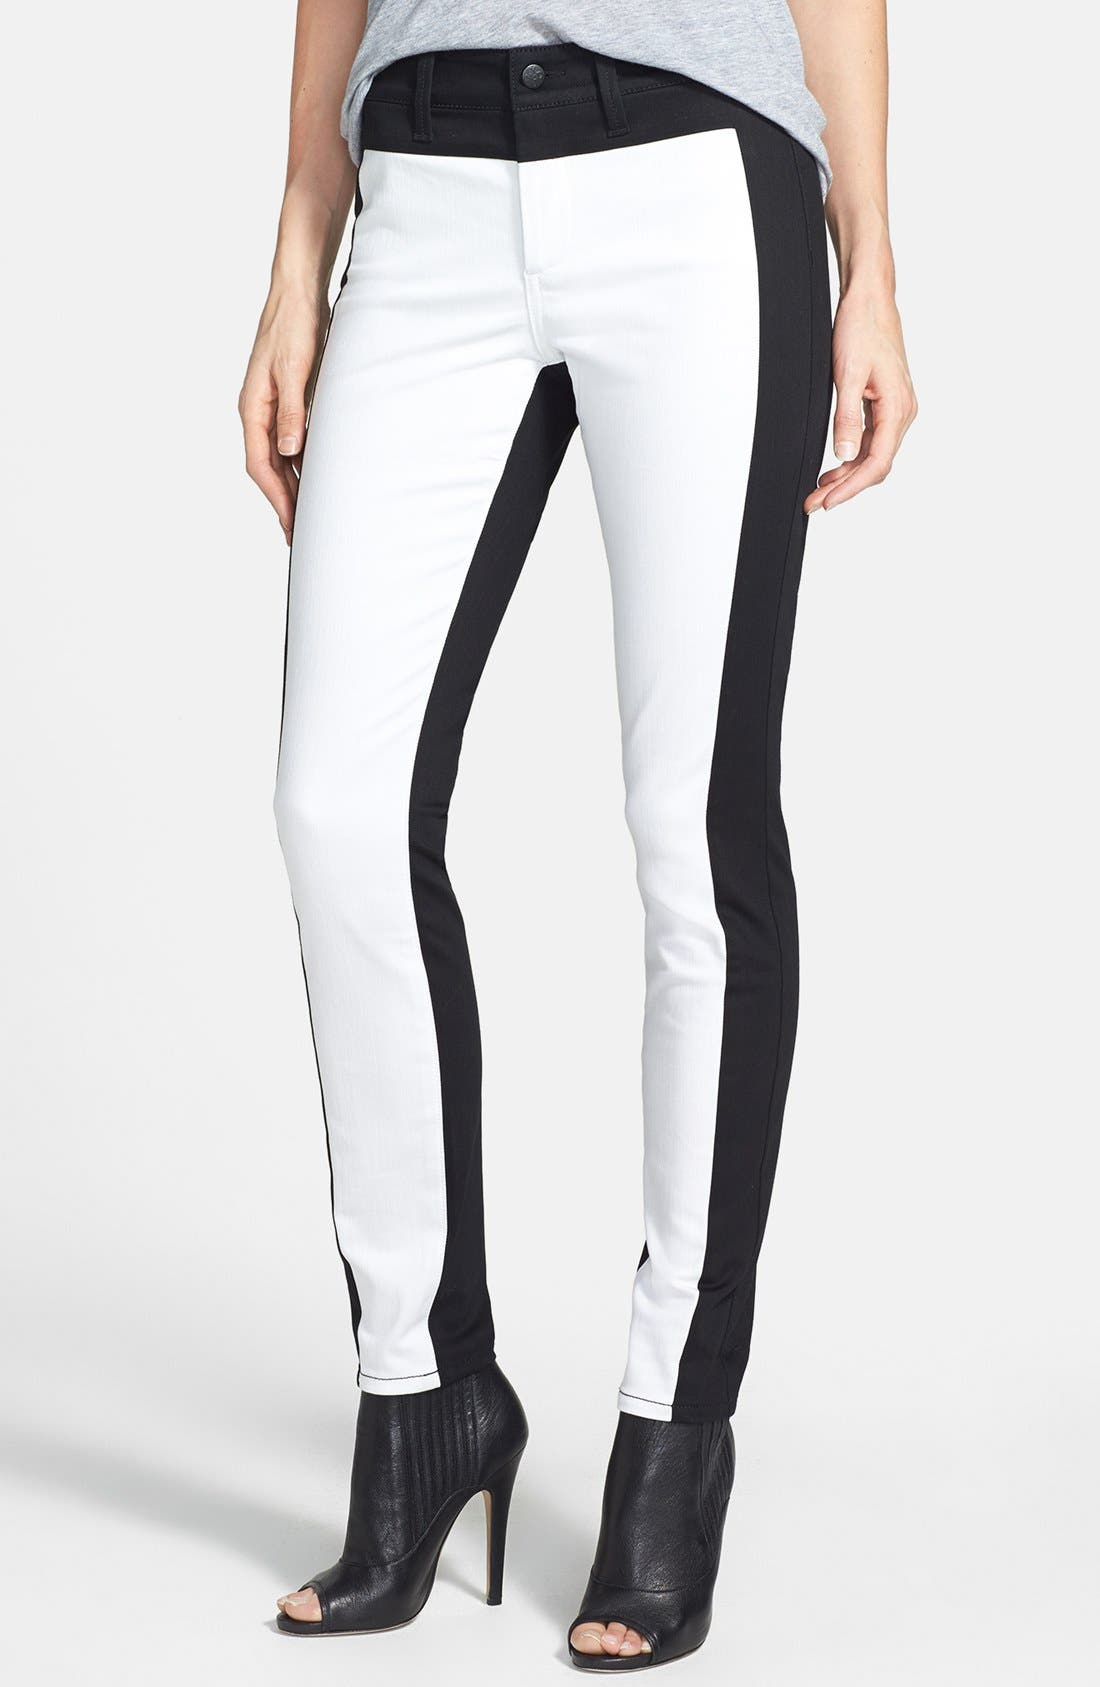 Main Image - NYDJ 'Aurora' Two-Tone Stretch Skinny Jeans (Optic White/Black)